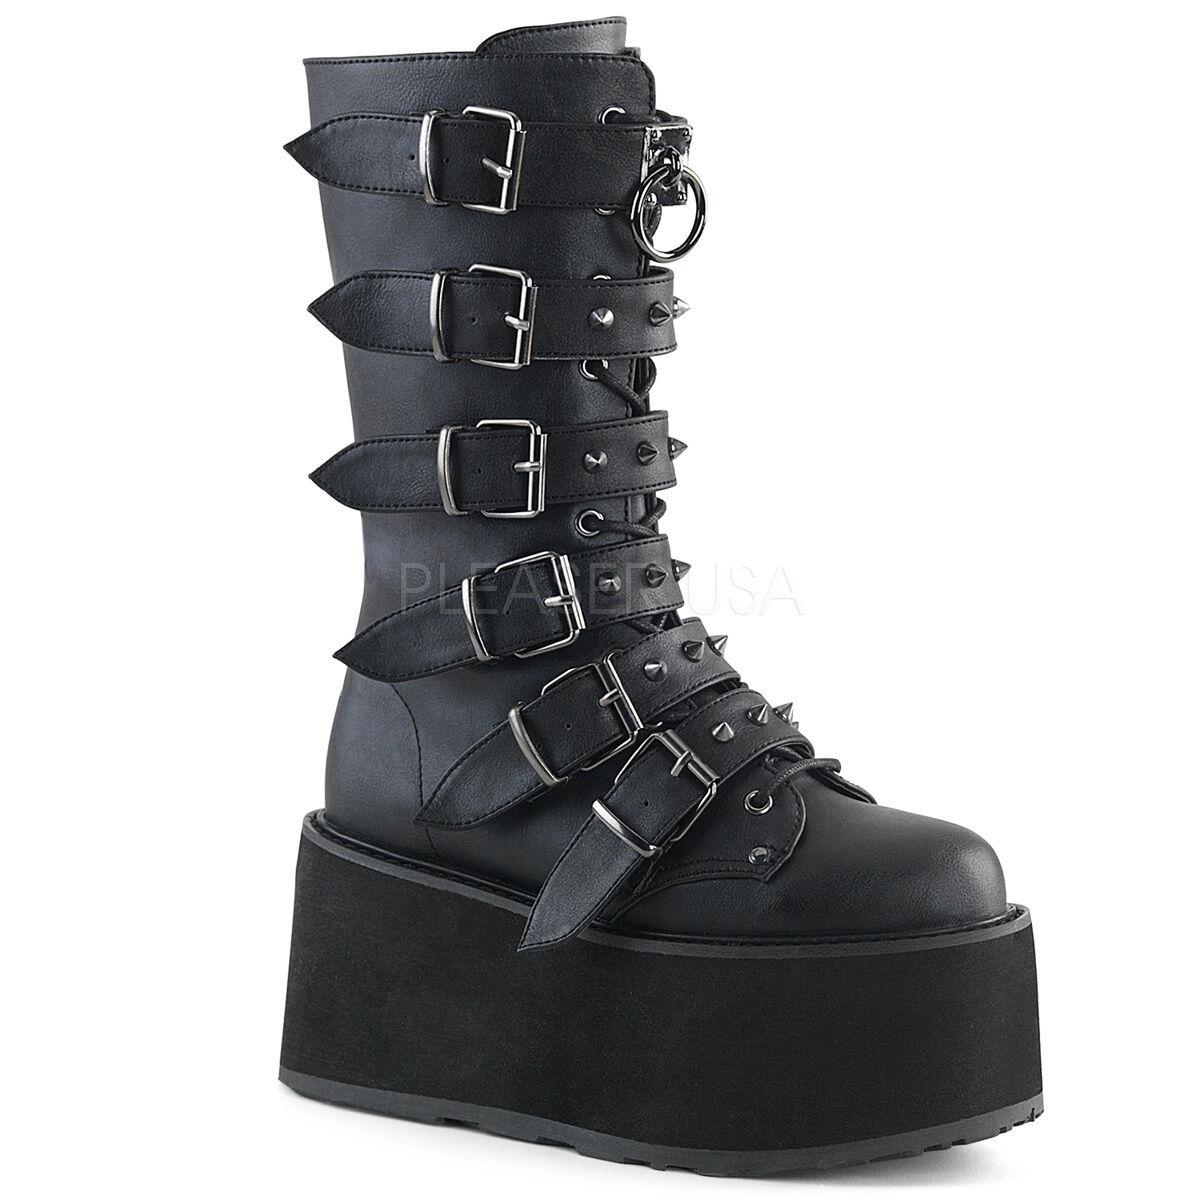 Demonia Negro Vegano 3.5  Plataforma botas Con Tachas Hebilla Mega Club Goth 6-12